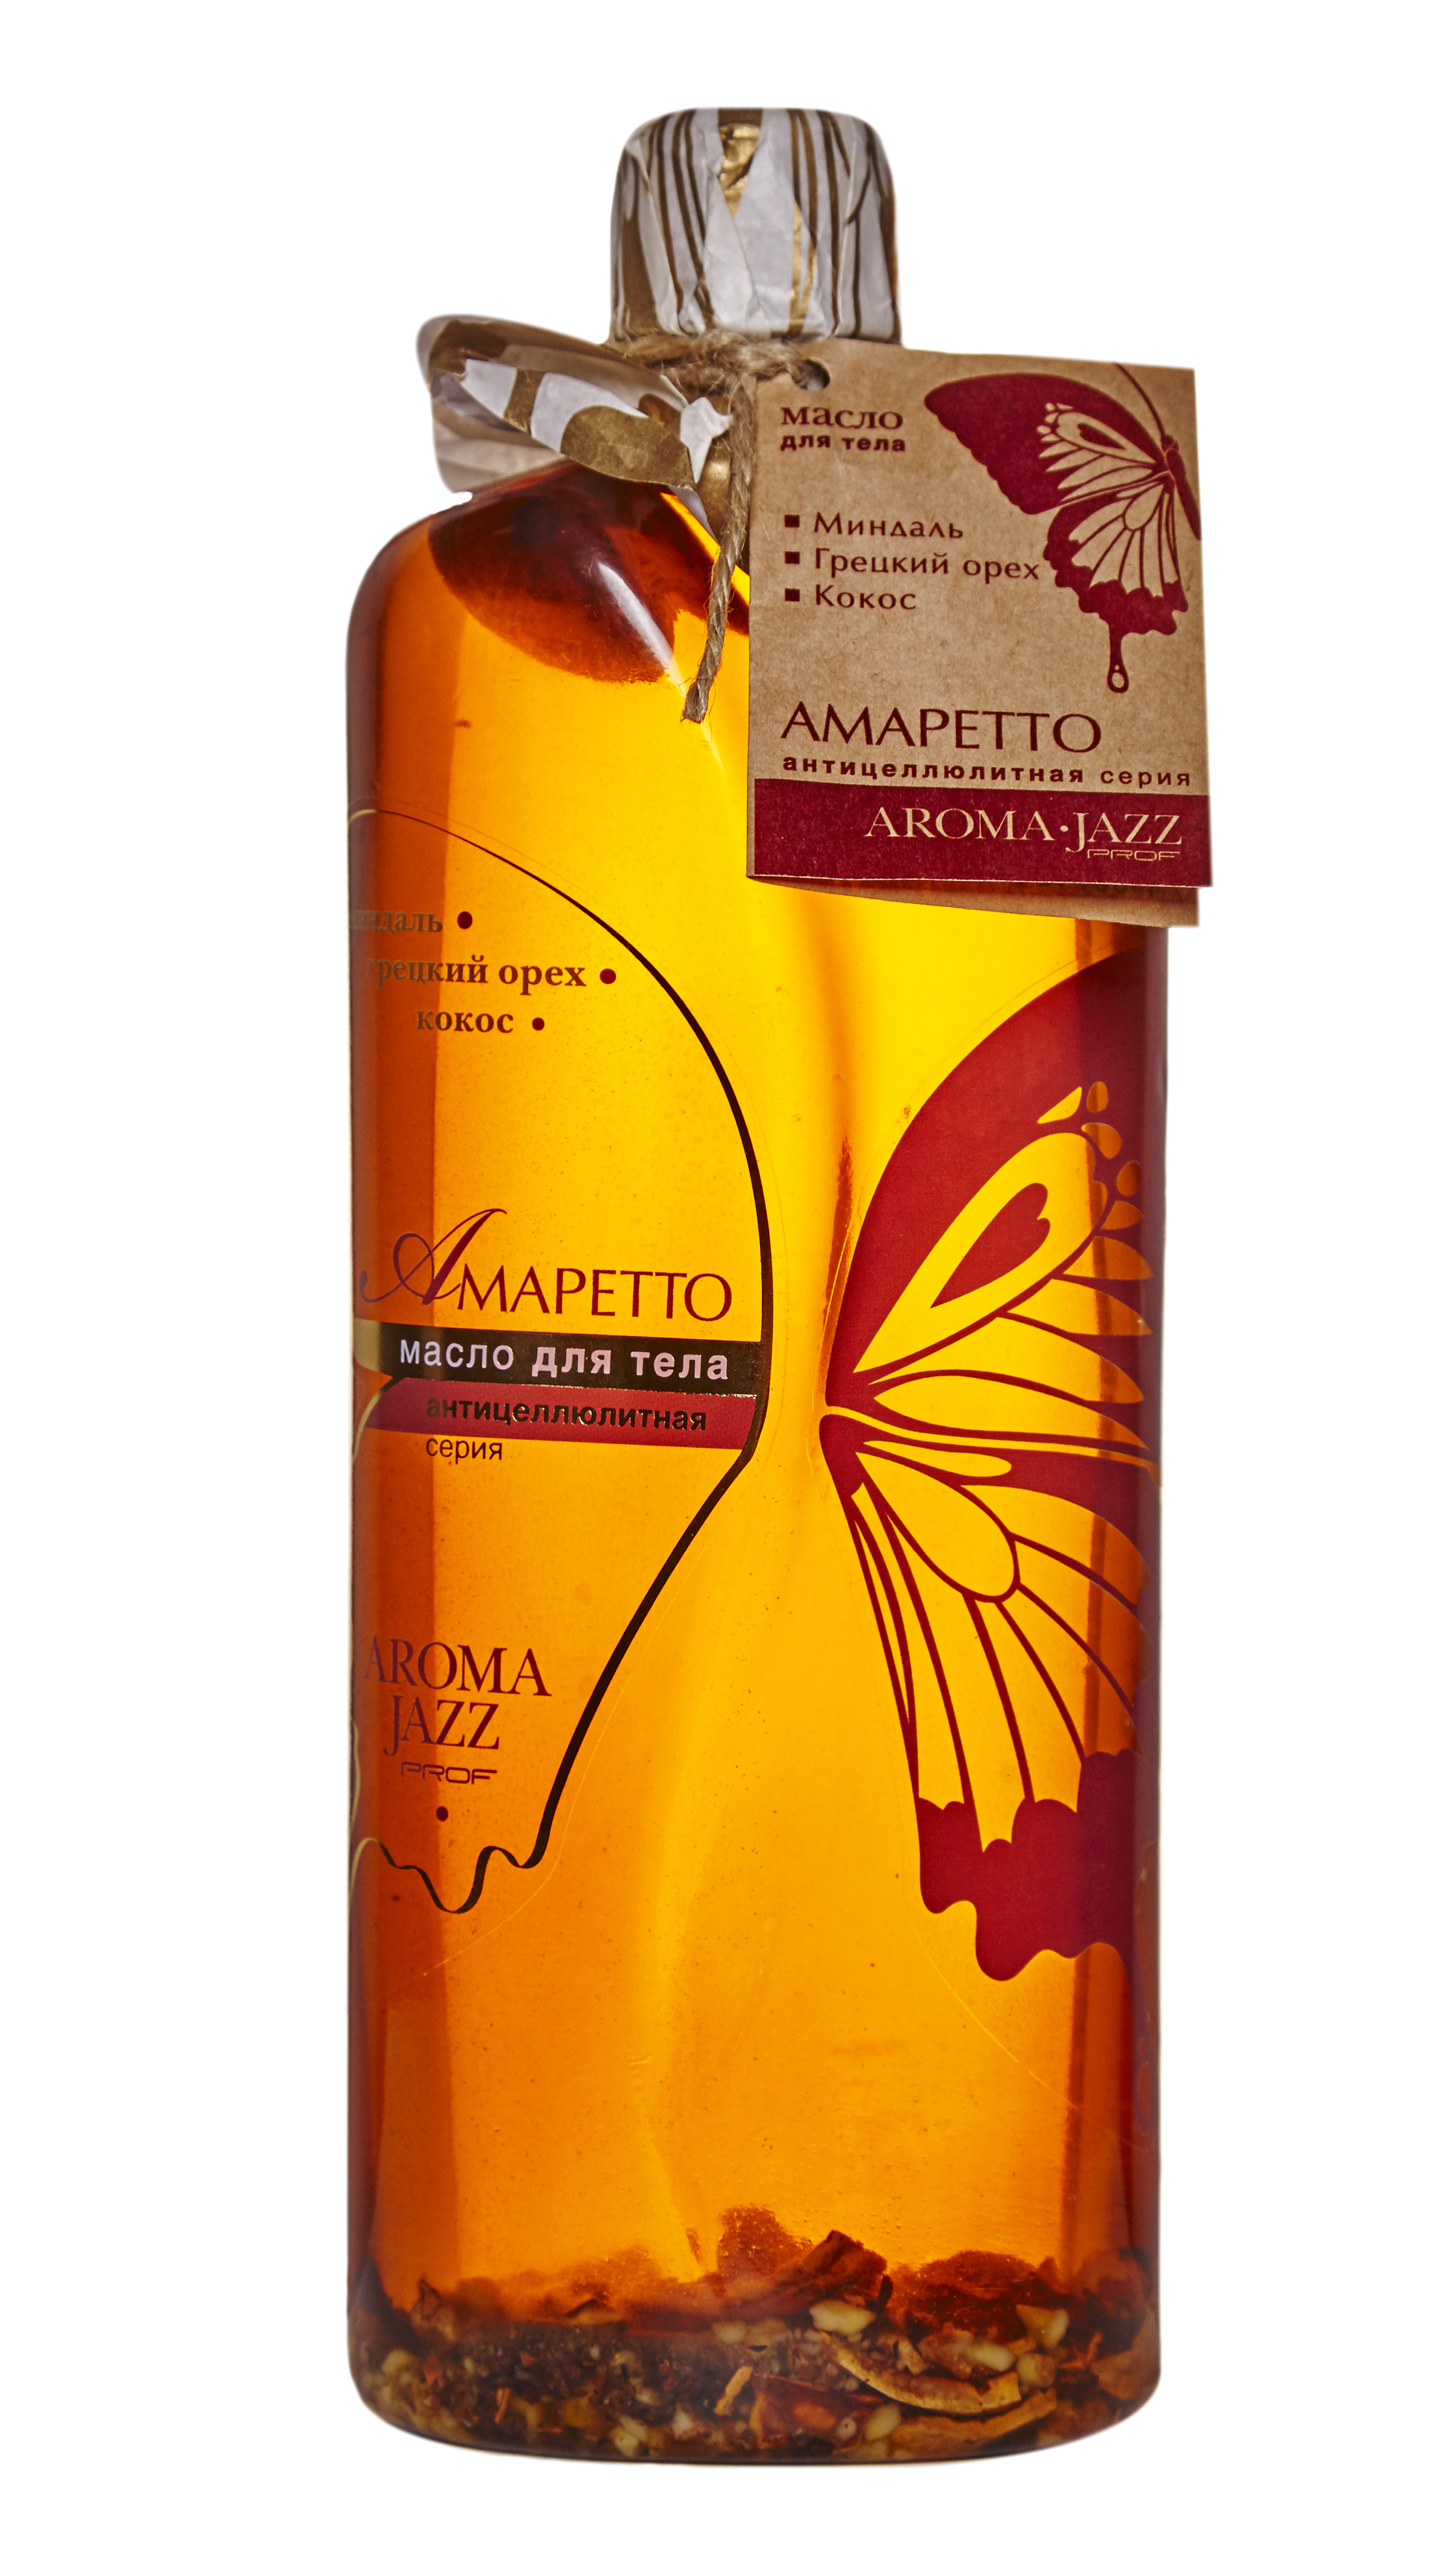 "AROMA JAZZ Масло массажное жидкое для тела ""Амаретто"" 1000мл"